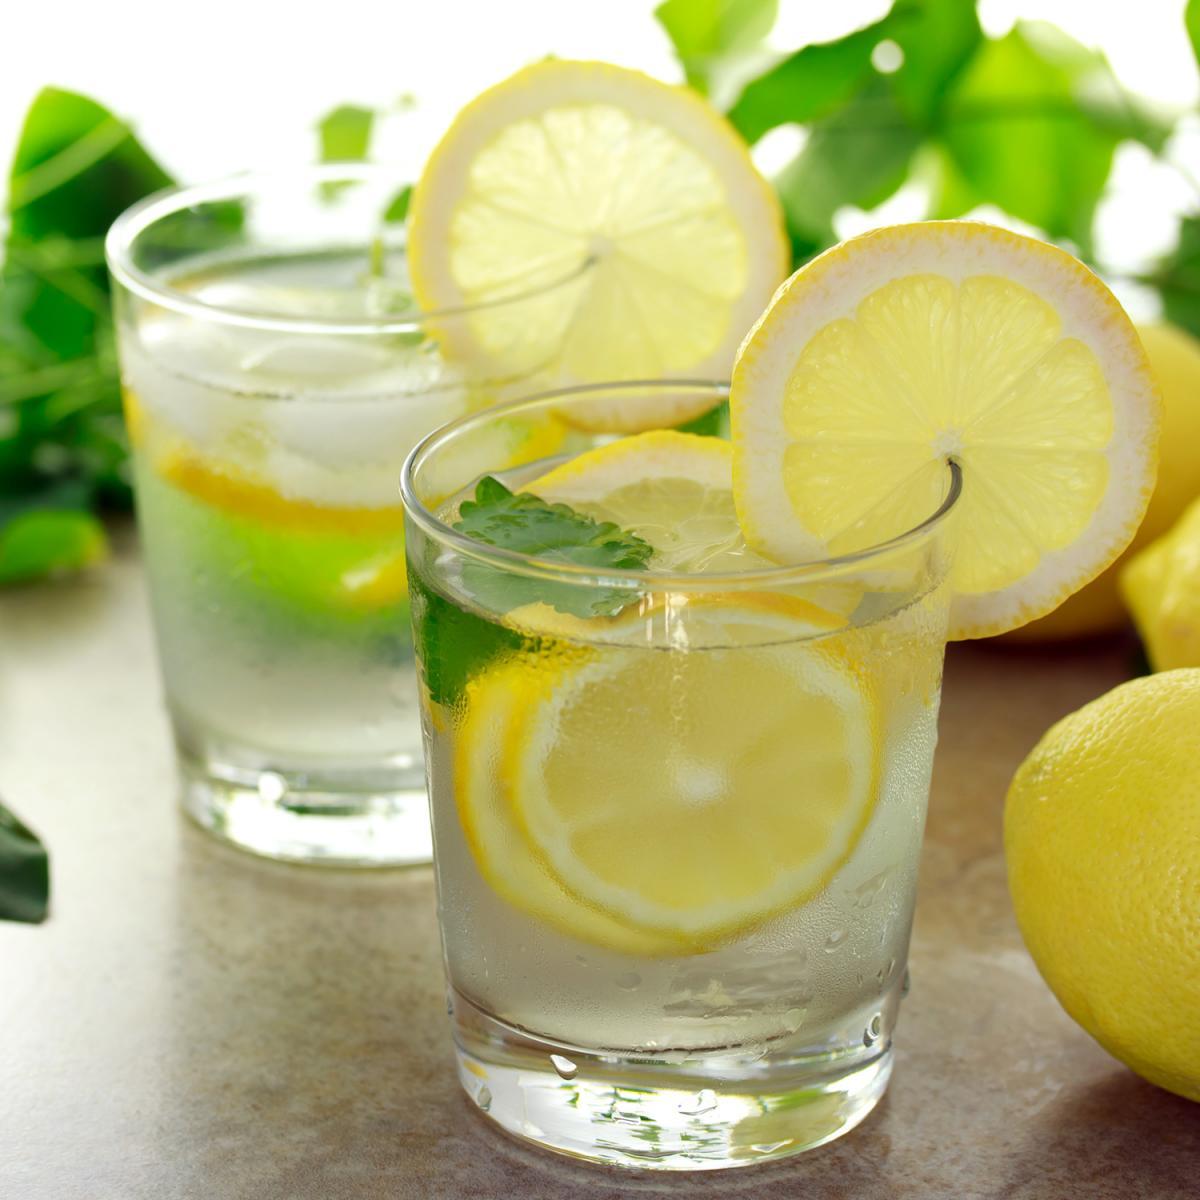 10-benefits-of-drinking-lemon-water11 6KT9s0